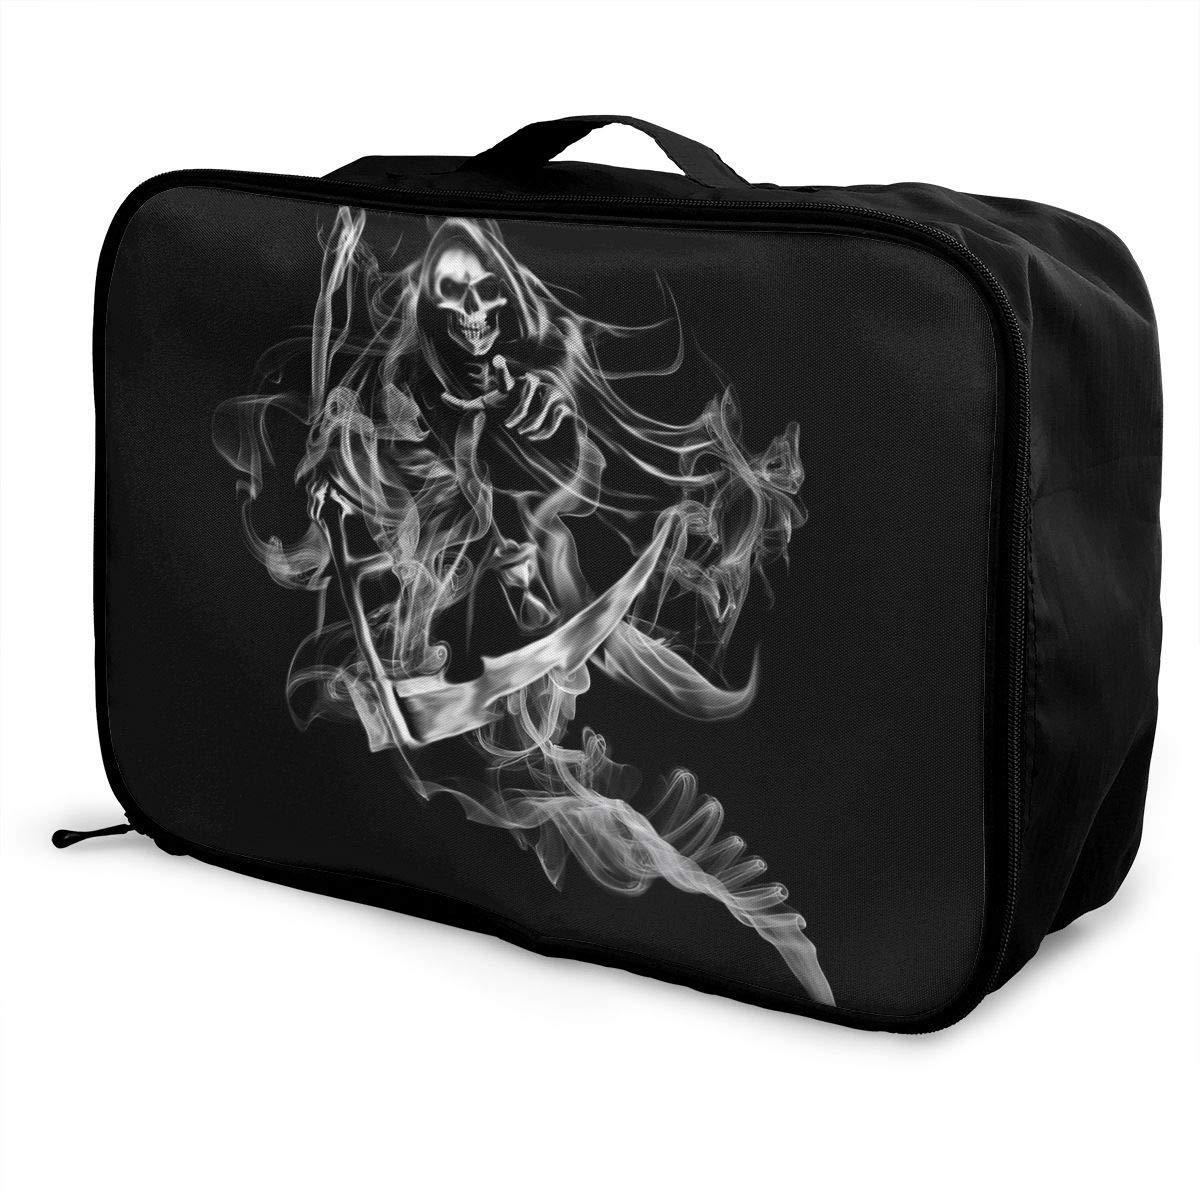 Travel Luggage Duffle Bag Lightweight Portable Handbag Art Skull Large Capacity Waterproof Foldable Storage Tote